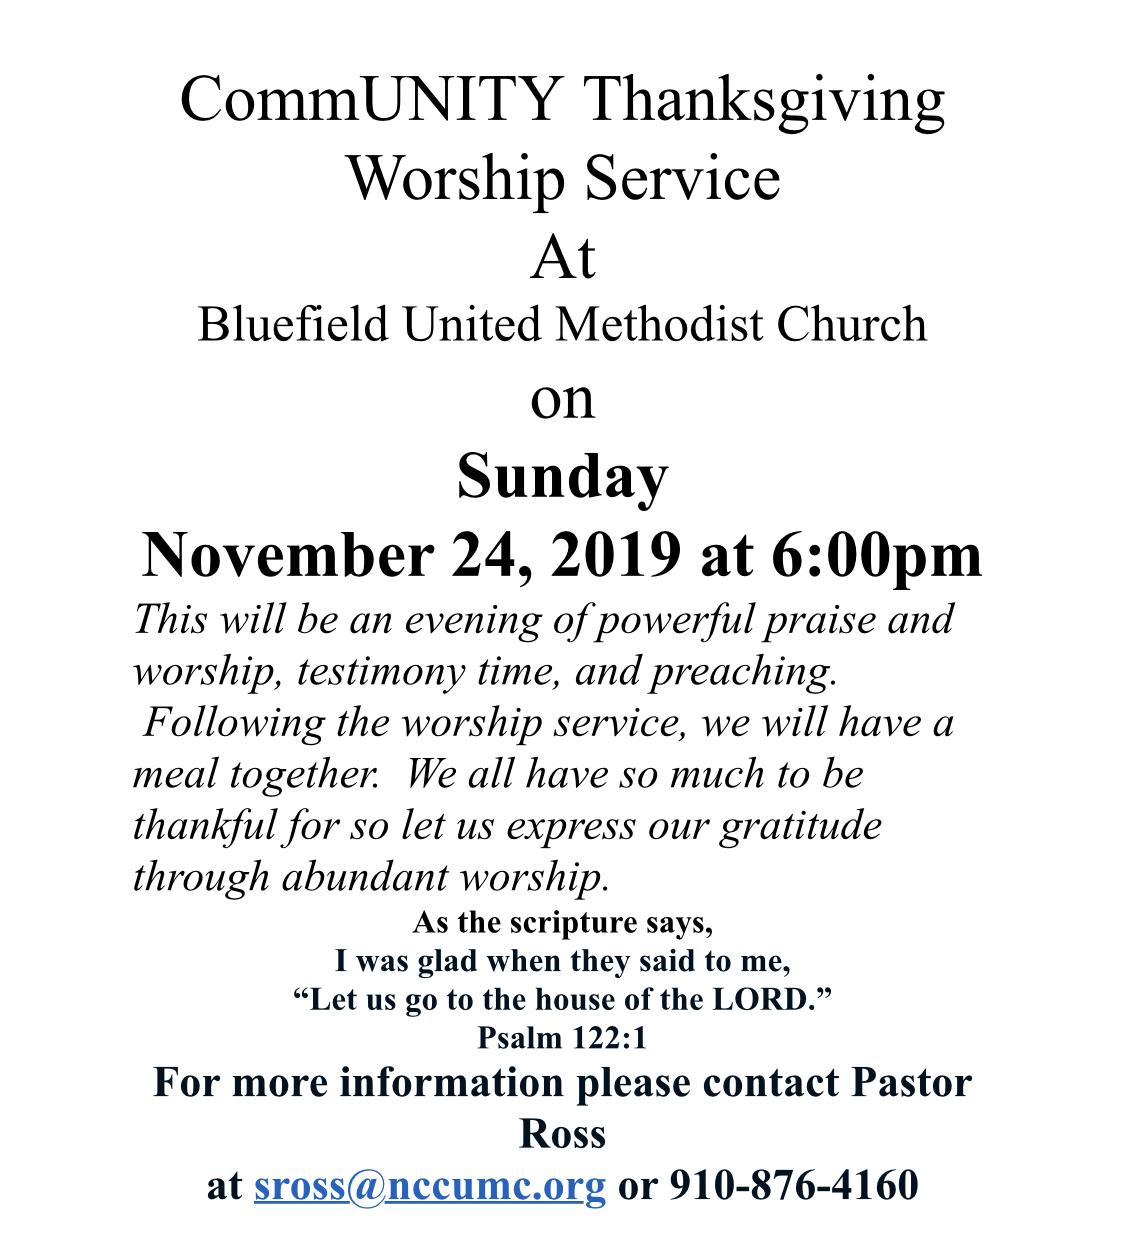 Bluefield UMC Community Thanksgiving Service